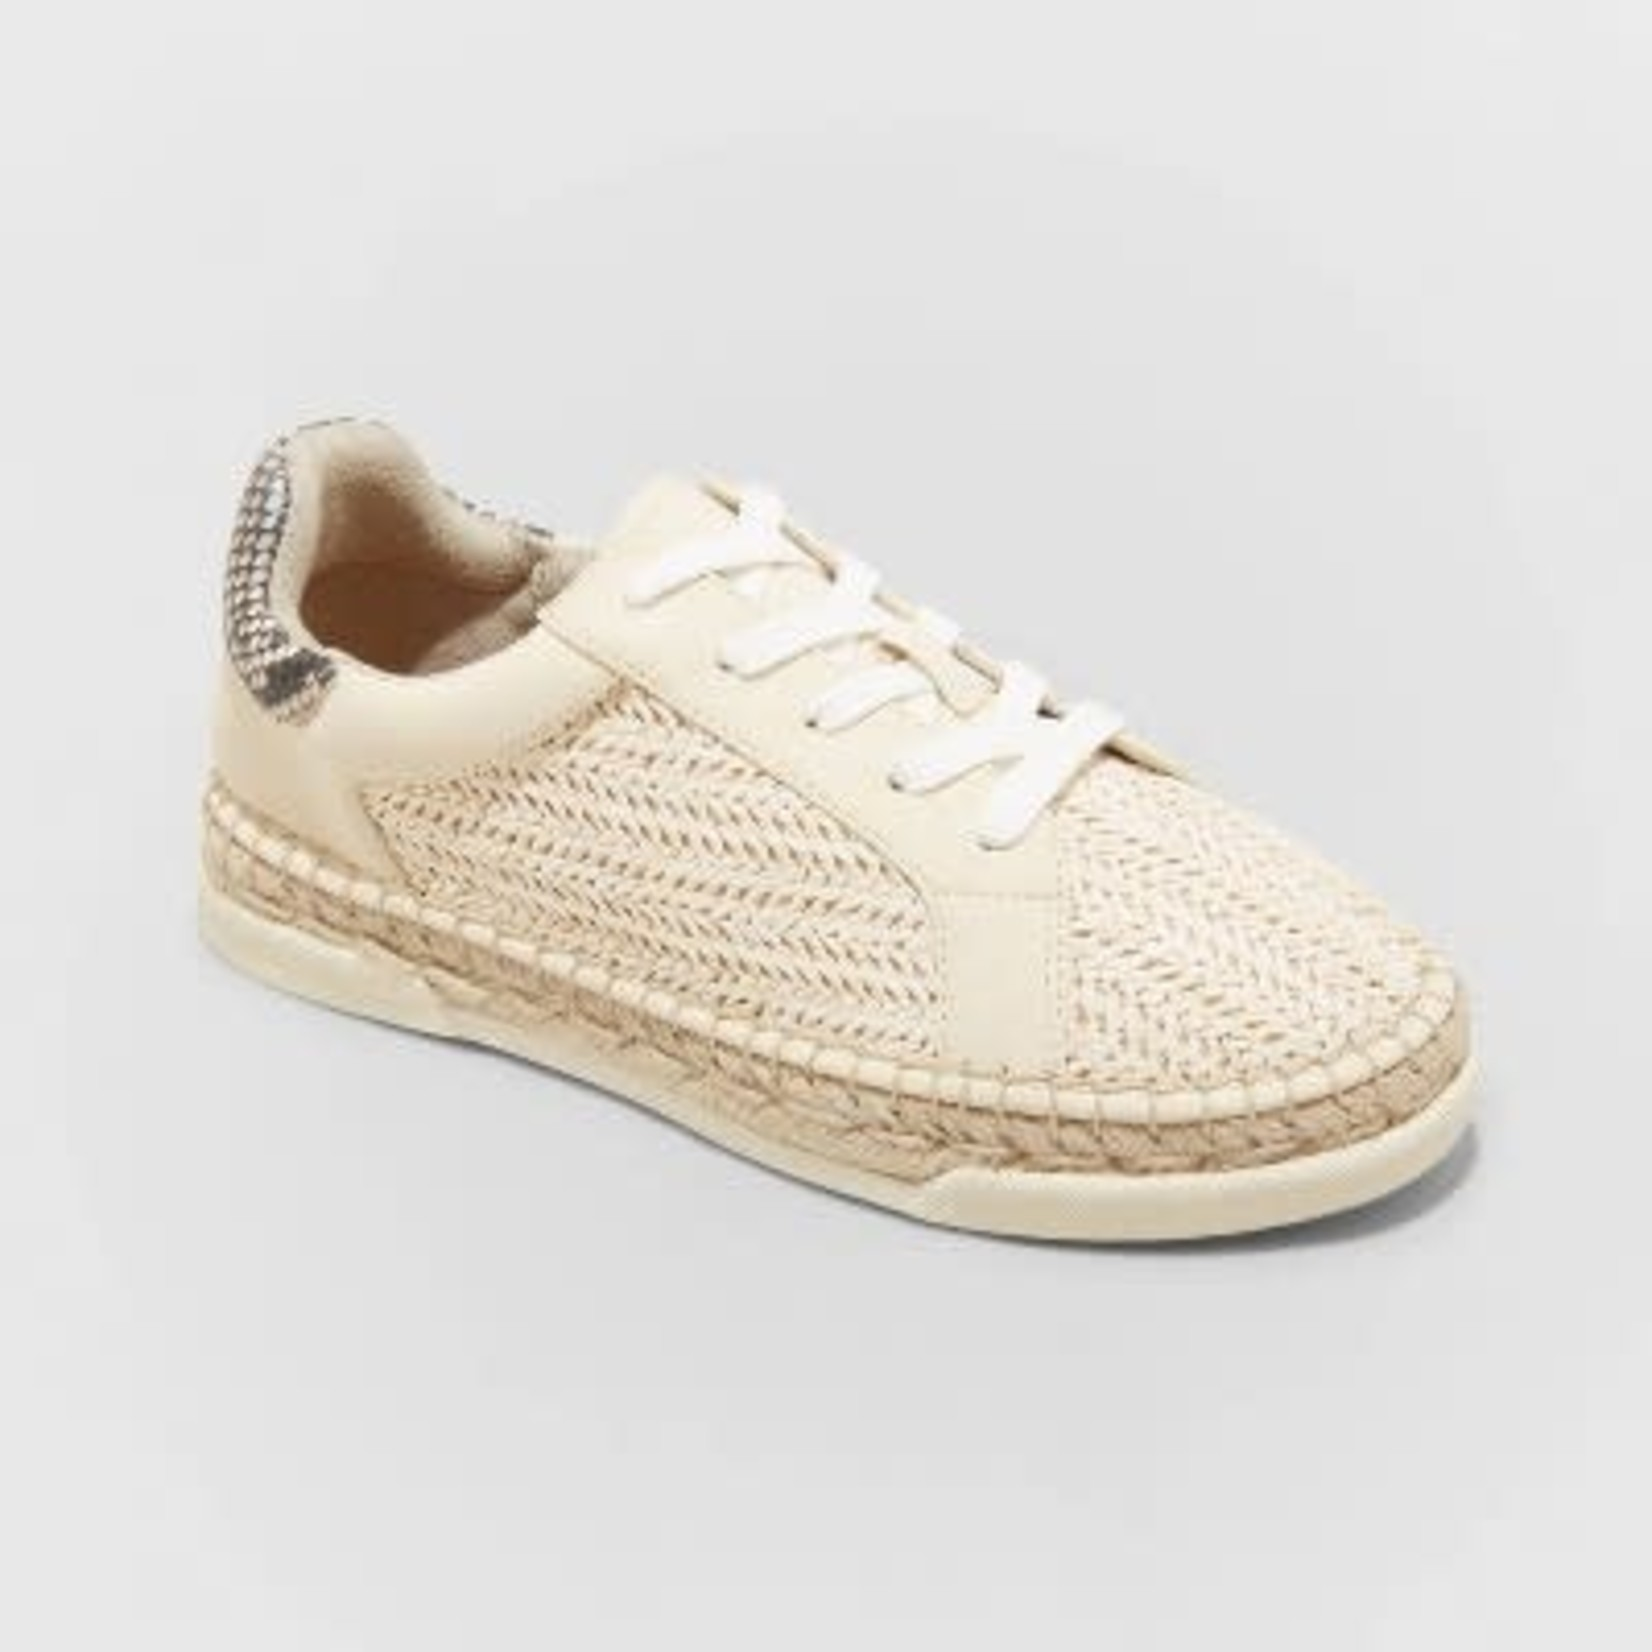 Women's Shaelyn Espadrille Sneakers - Universal Thread - 9.5